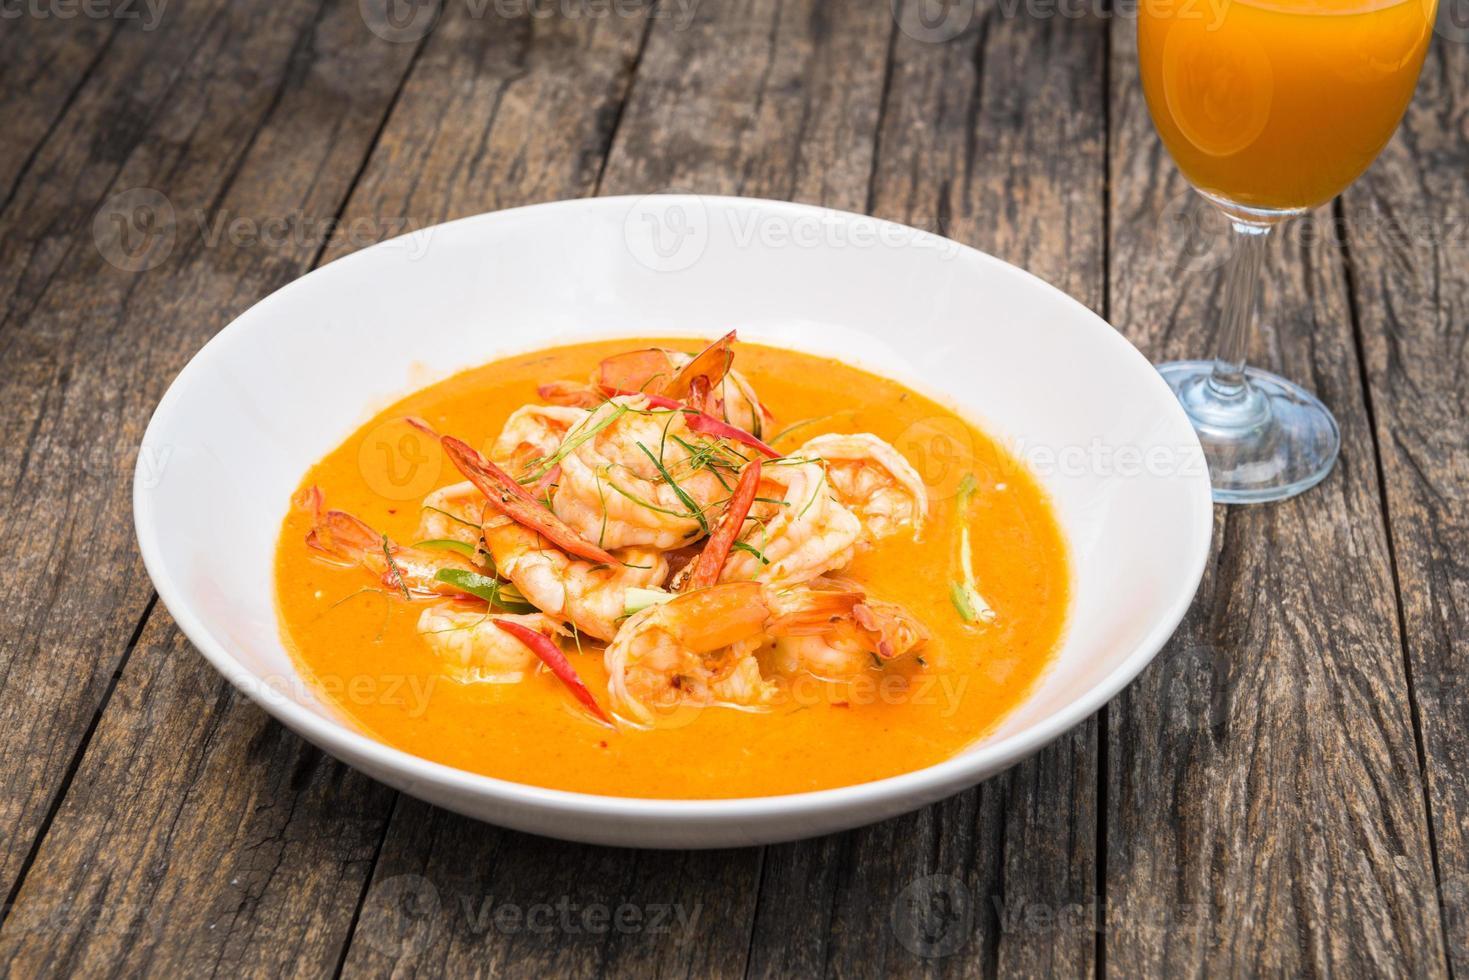 Thaise panang curry met garnalen foto